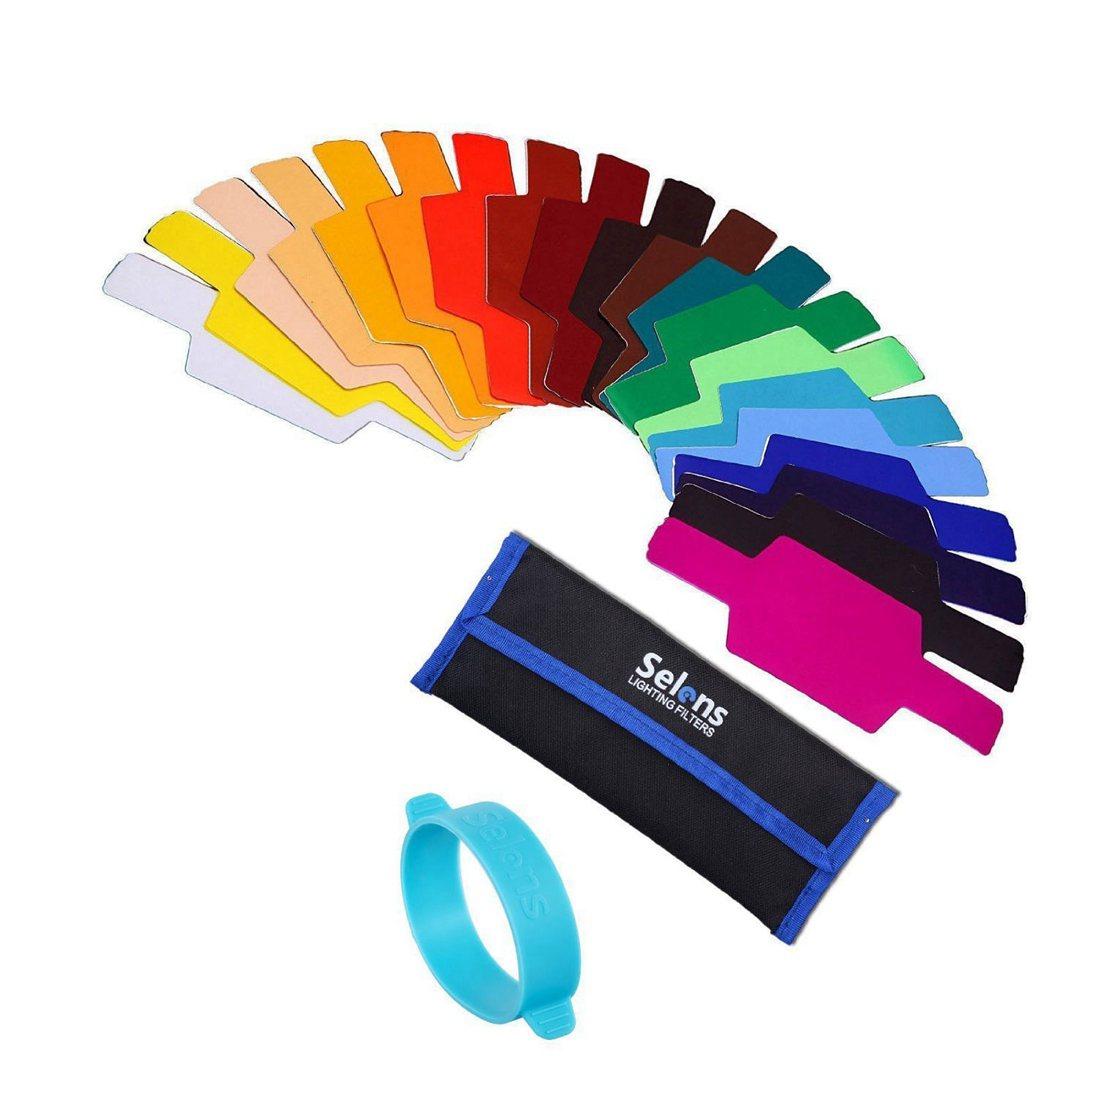 Selens Universal Flash Gels Lighting Filter SE-CG20 - 20 pcs Combination Kits for Camera Flash light ...